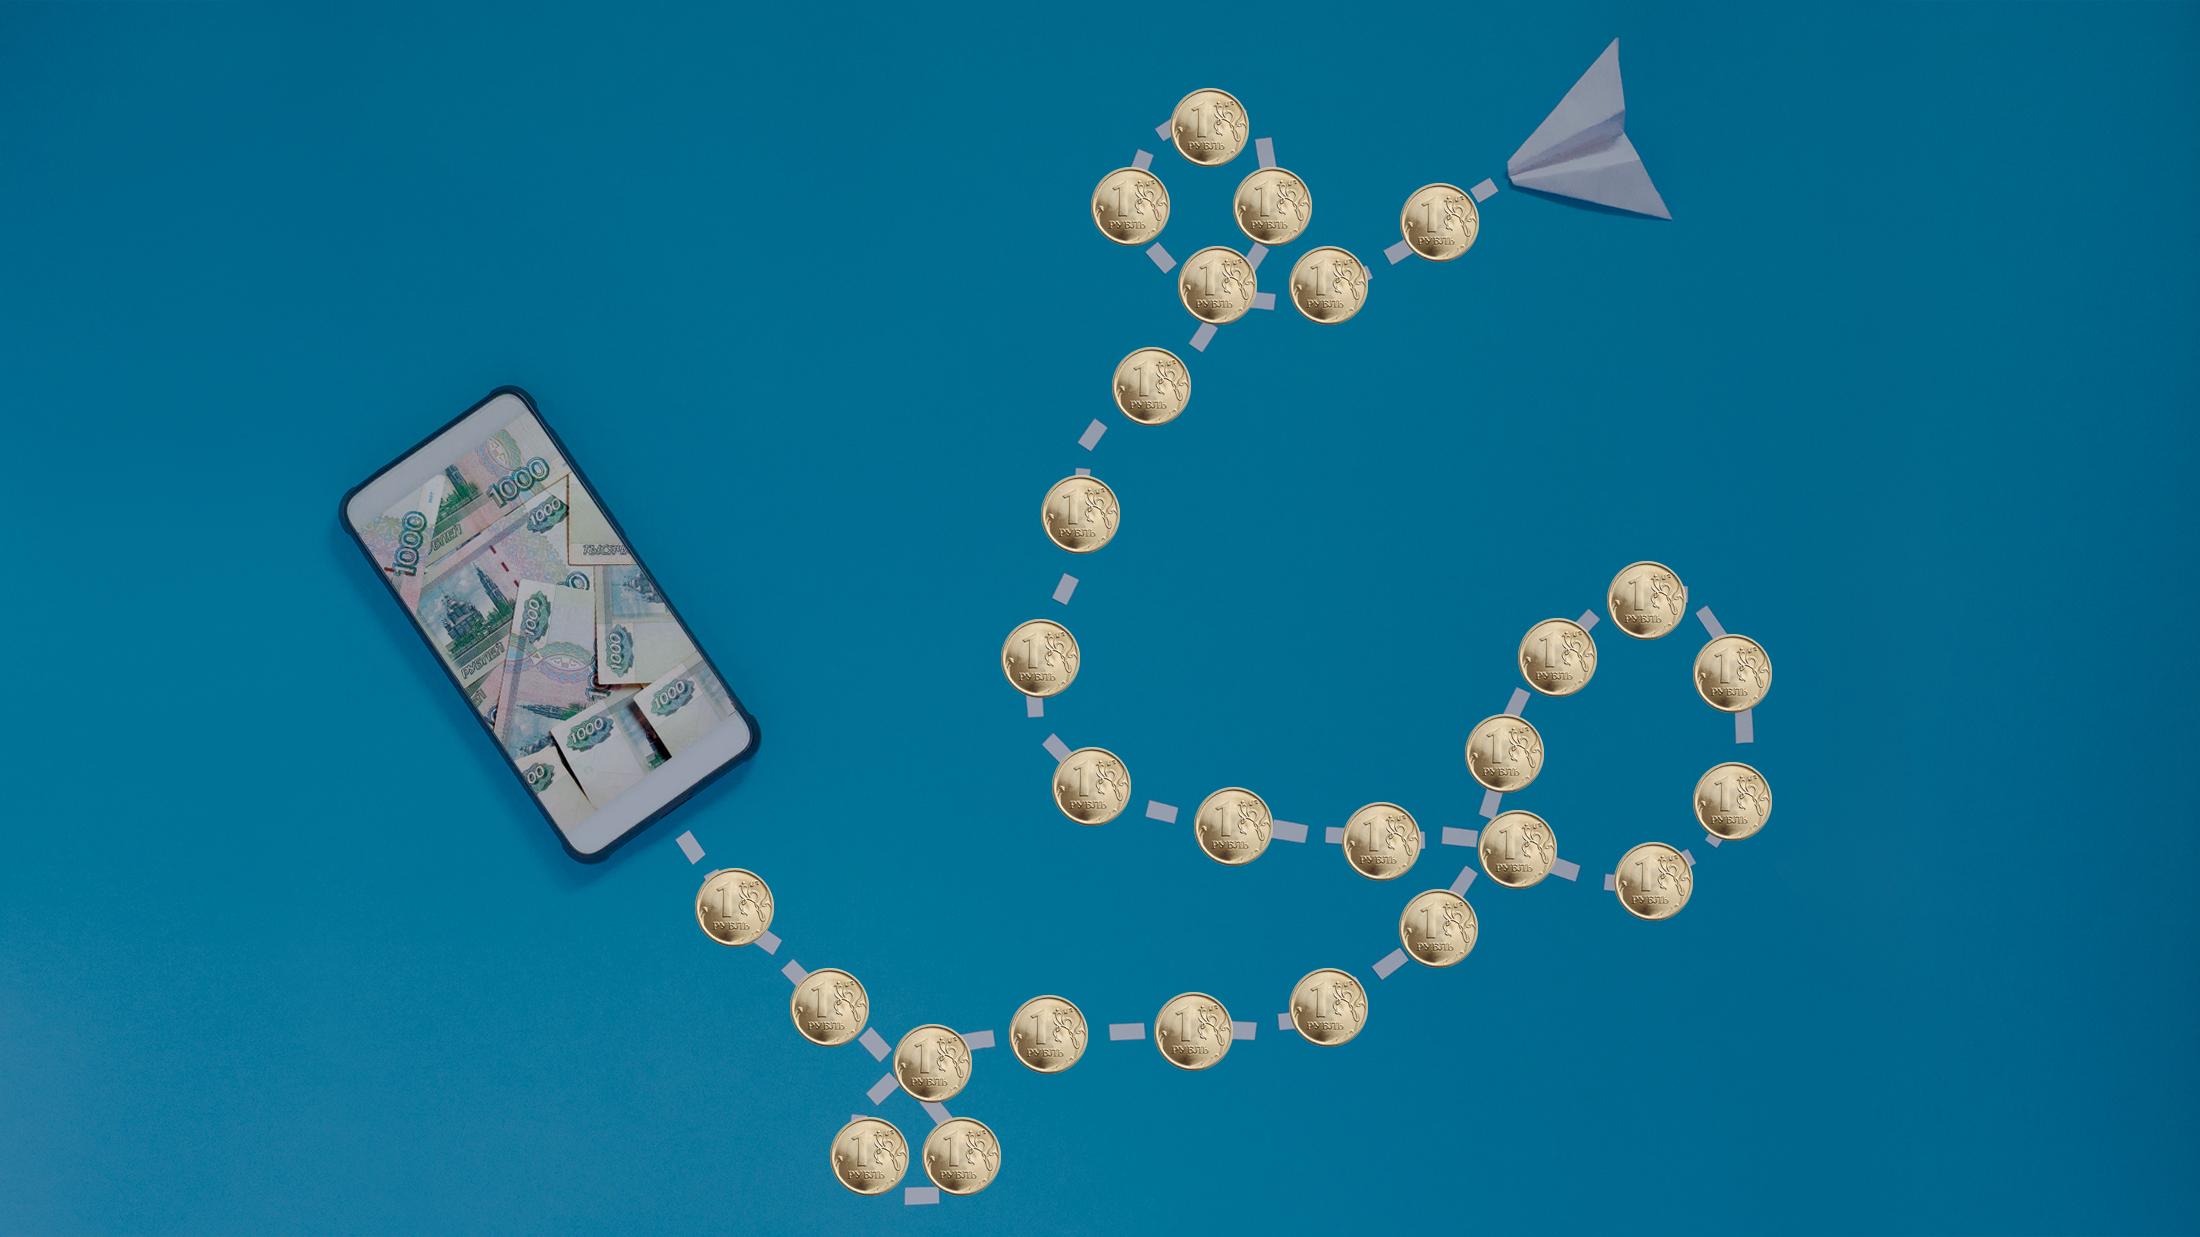 "<p>Коллаж © LIFE. Фото © <a href=""https://ru.depositphotos.com/361509610/stock-photo-message-flying-phone-way-communication.html"" target=""_blank"" rel=""noopener noreferrer"">Depositphotos</a></p>"